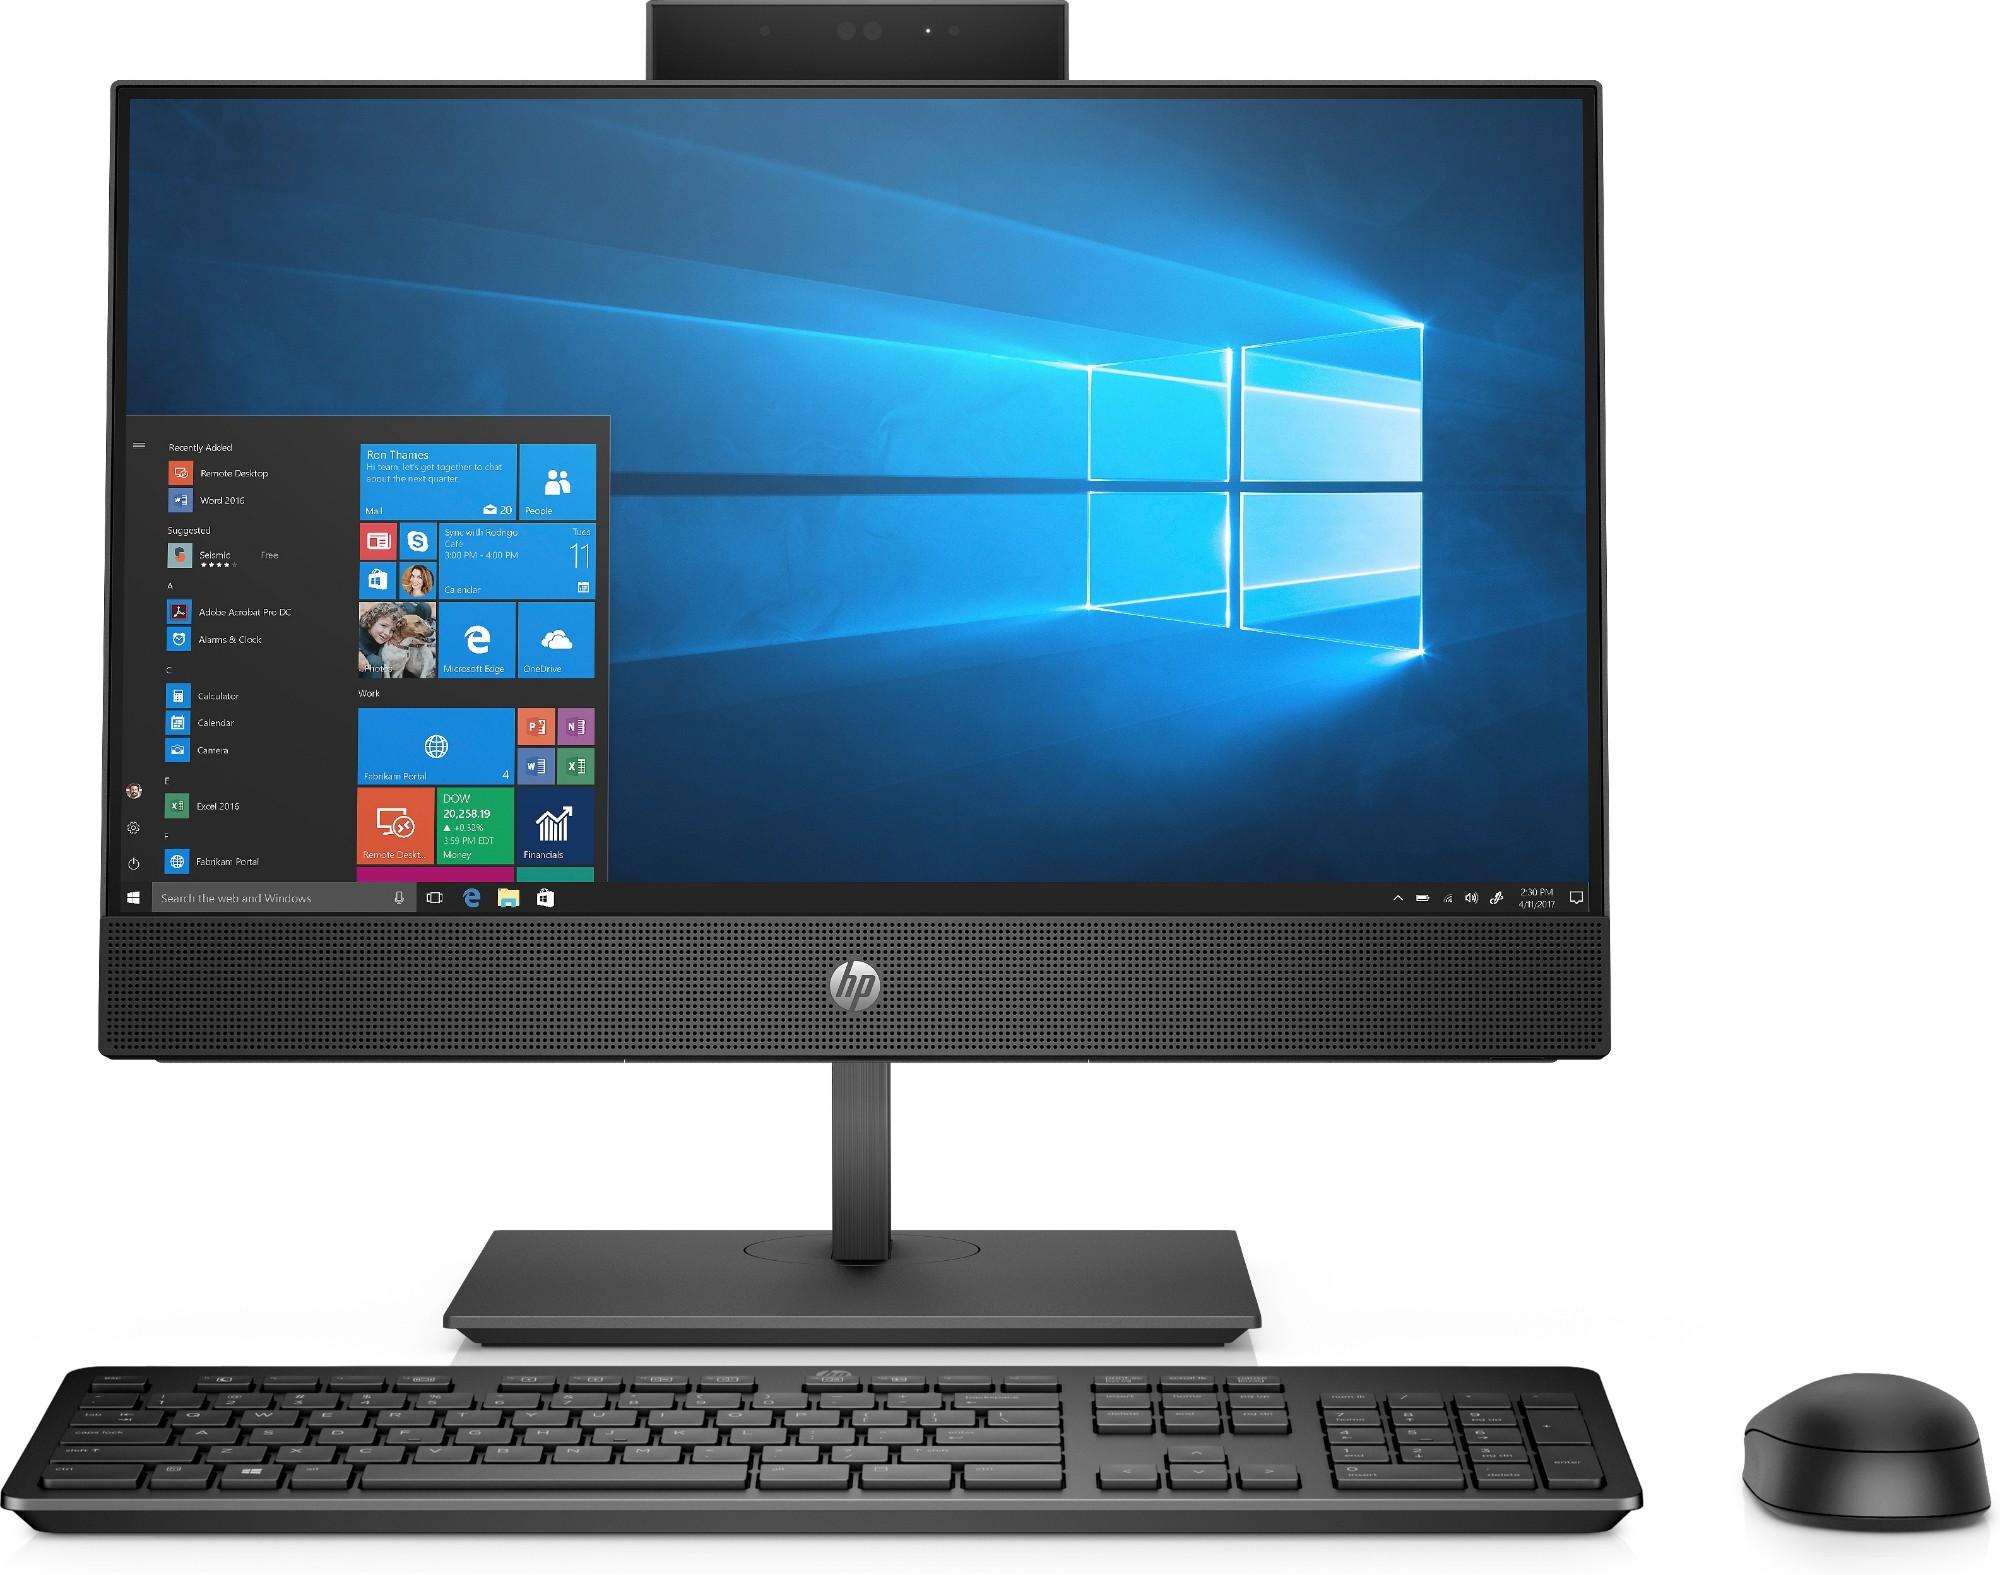 "HP ProOne 600 G5 54,6 cm (21.5"") 1920 x 1080 Pixeles Pantalla táctil 9na generación de procesadores Intel® Core™ i5 8 GB DDR4-SDRAM 256 GB SSD Wi-Fi 5 (802.11ac) Negro PC todo en uno Windows 10 Pro"